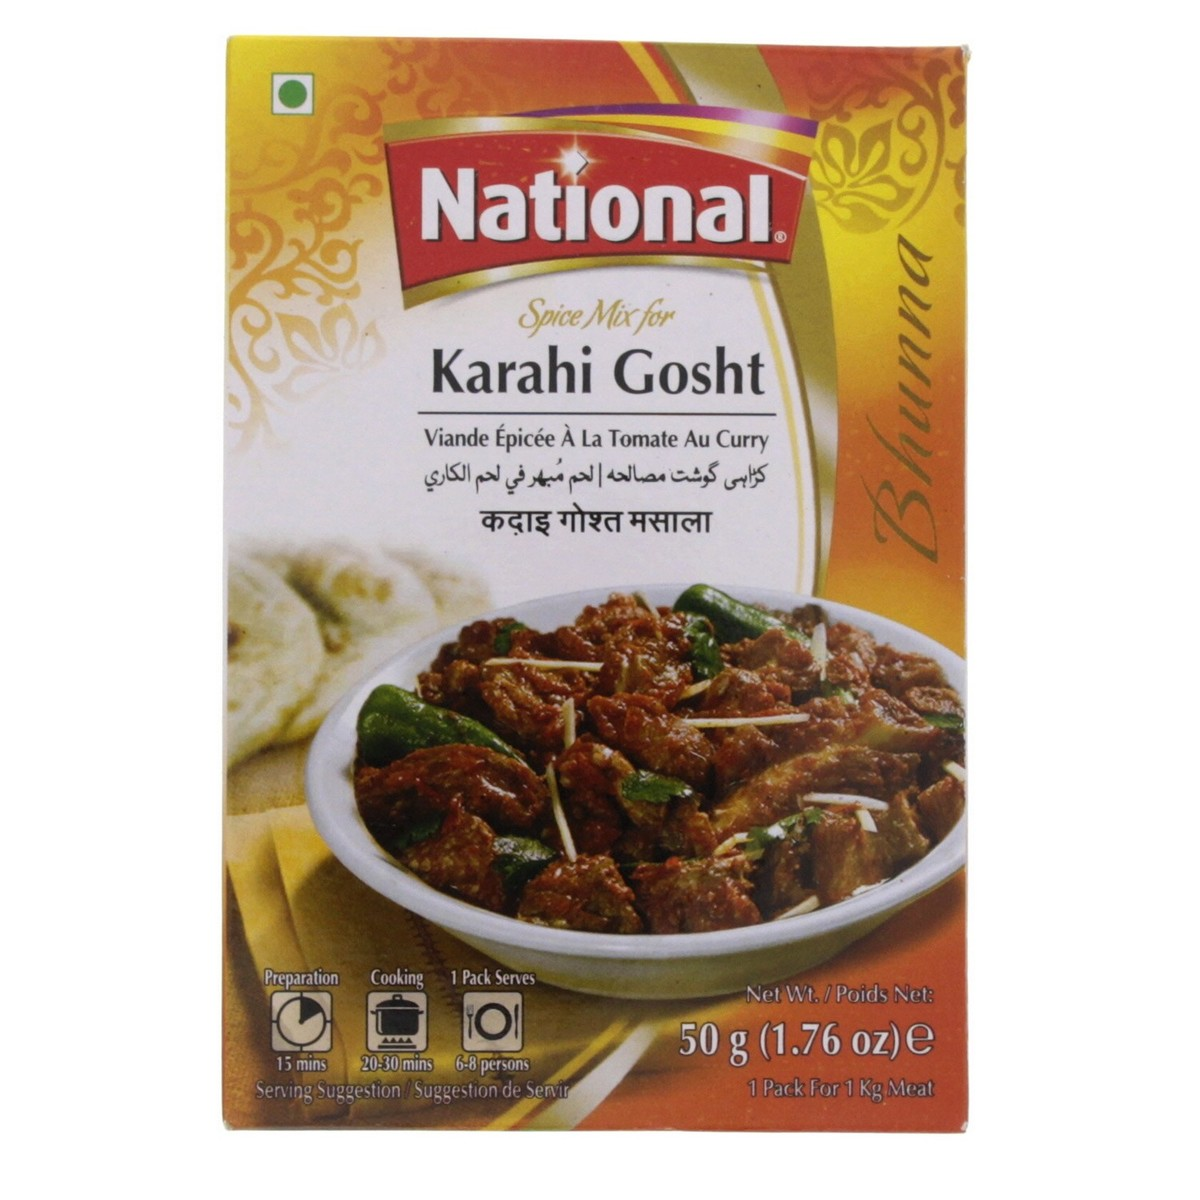 National Karahi Gosht Masala